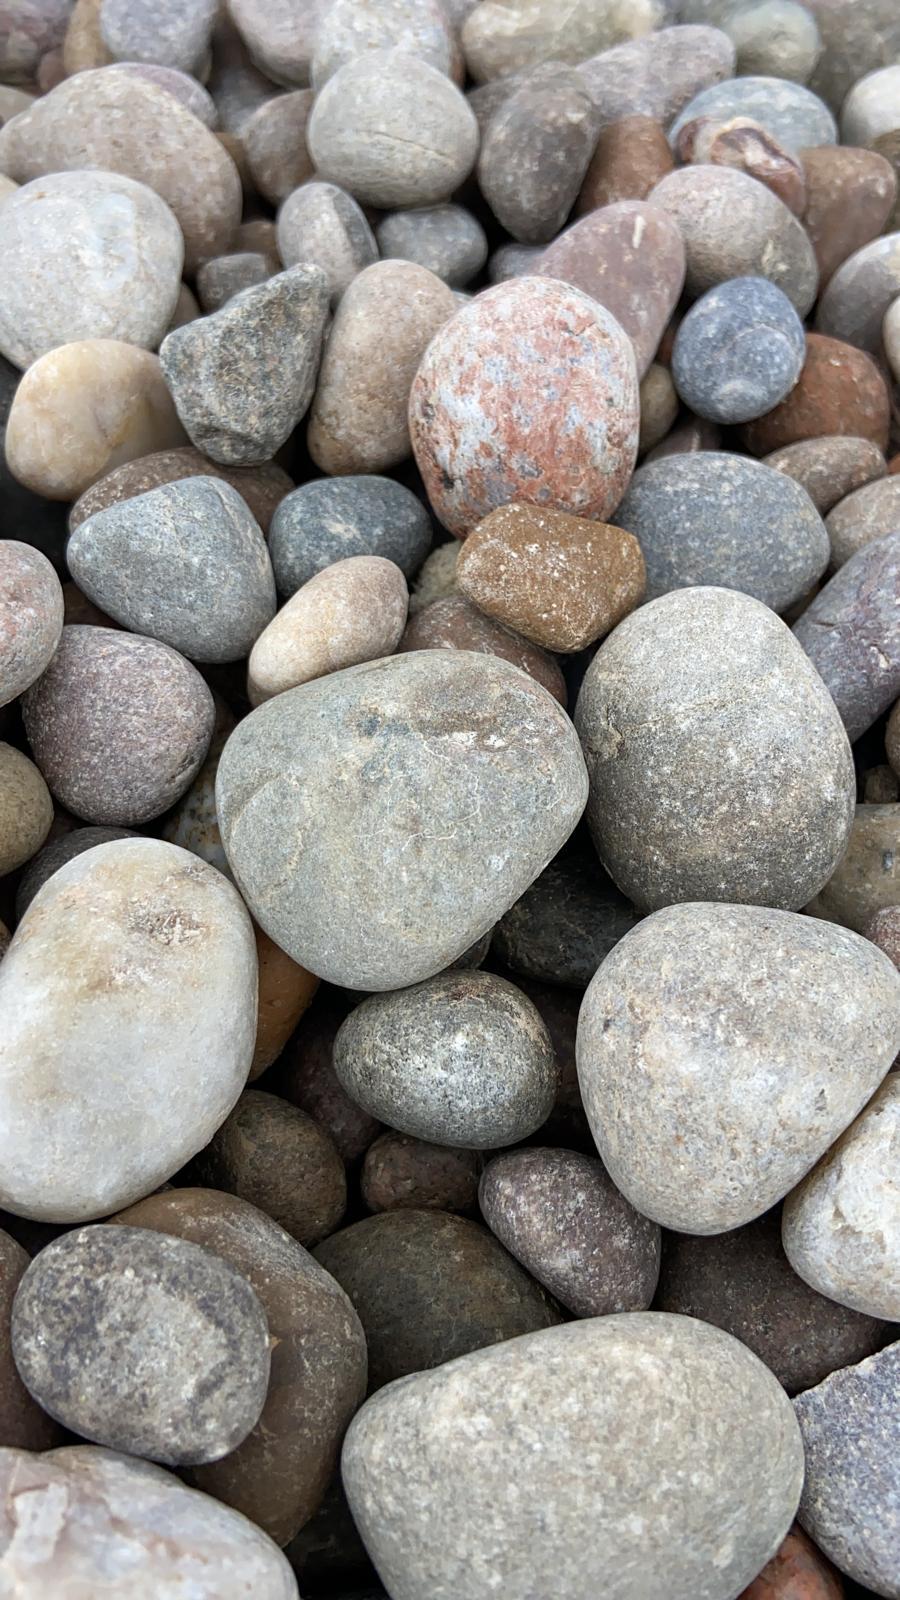 20-30mm Caledonian Pebbles